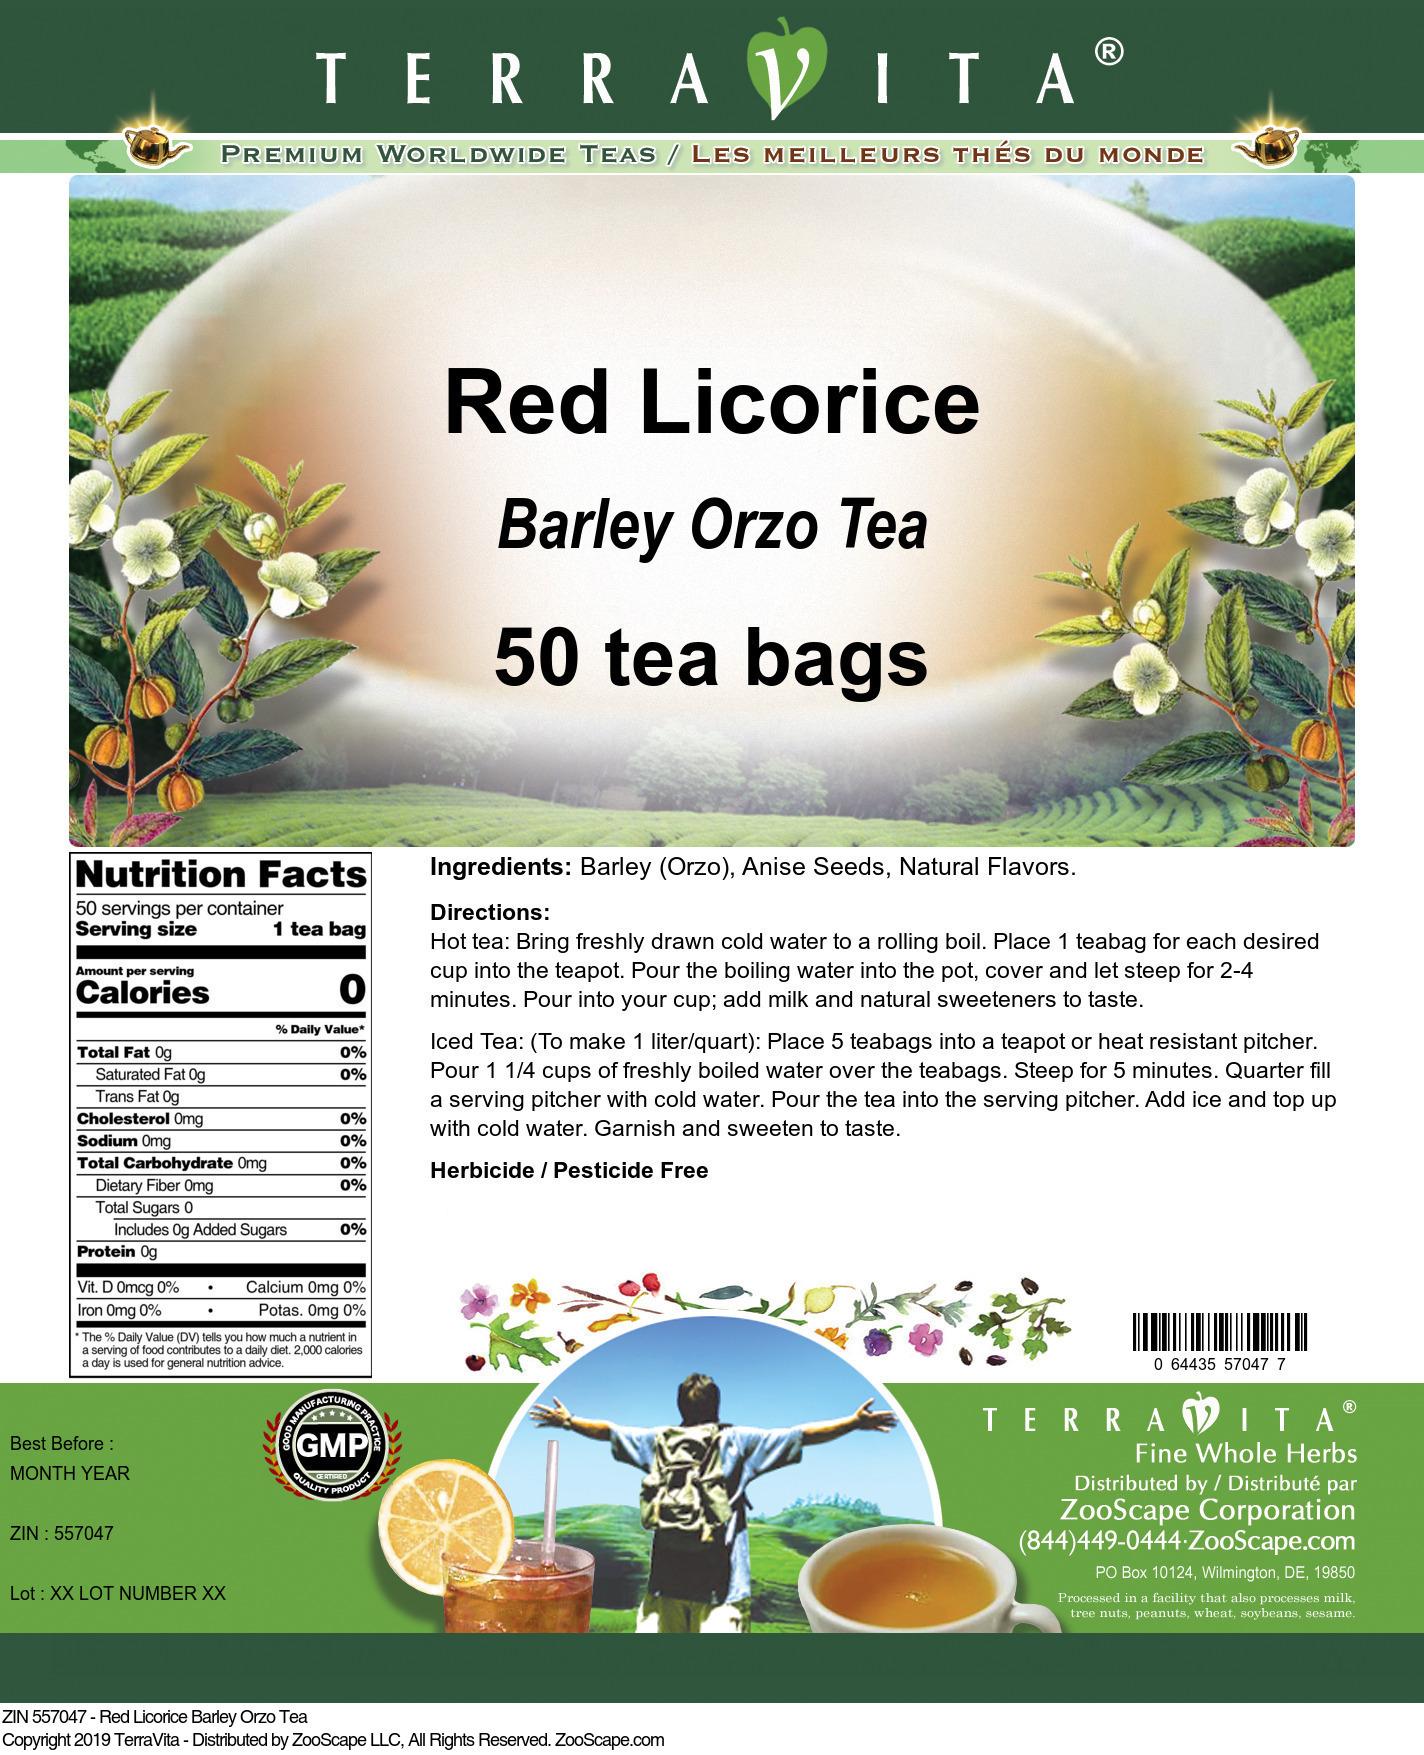 Red Licorice Barley Orzo